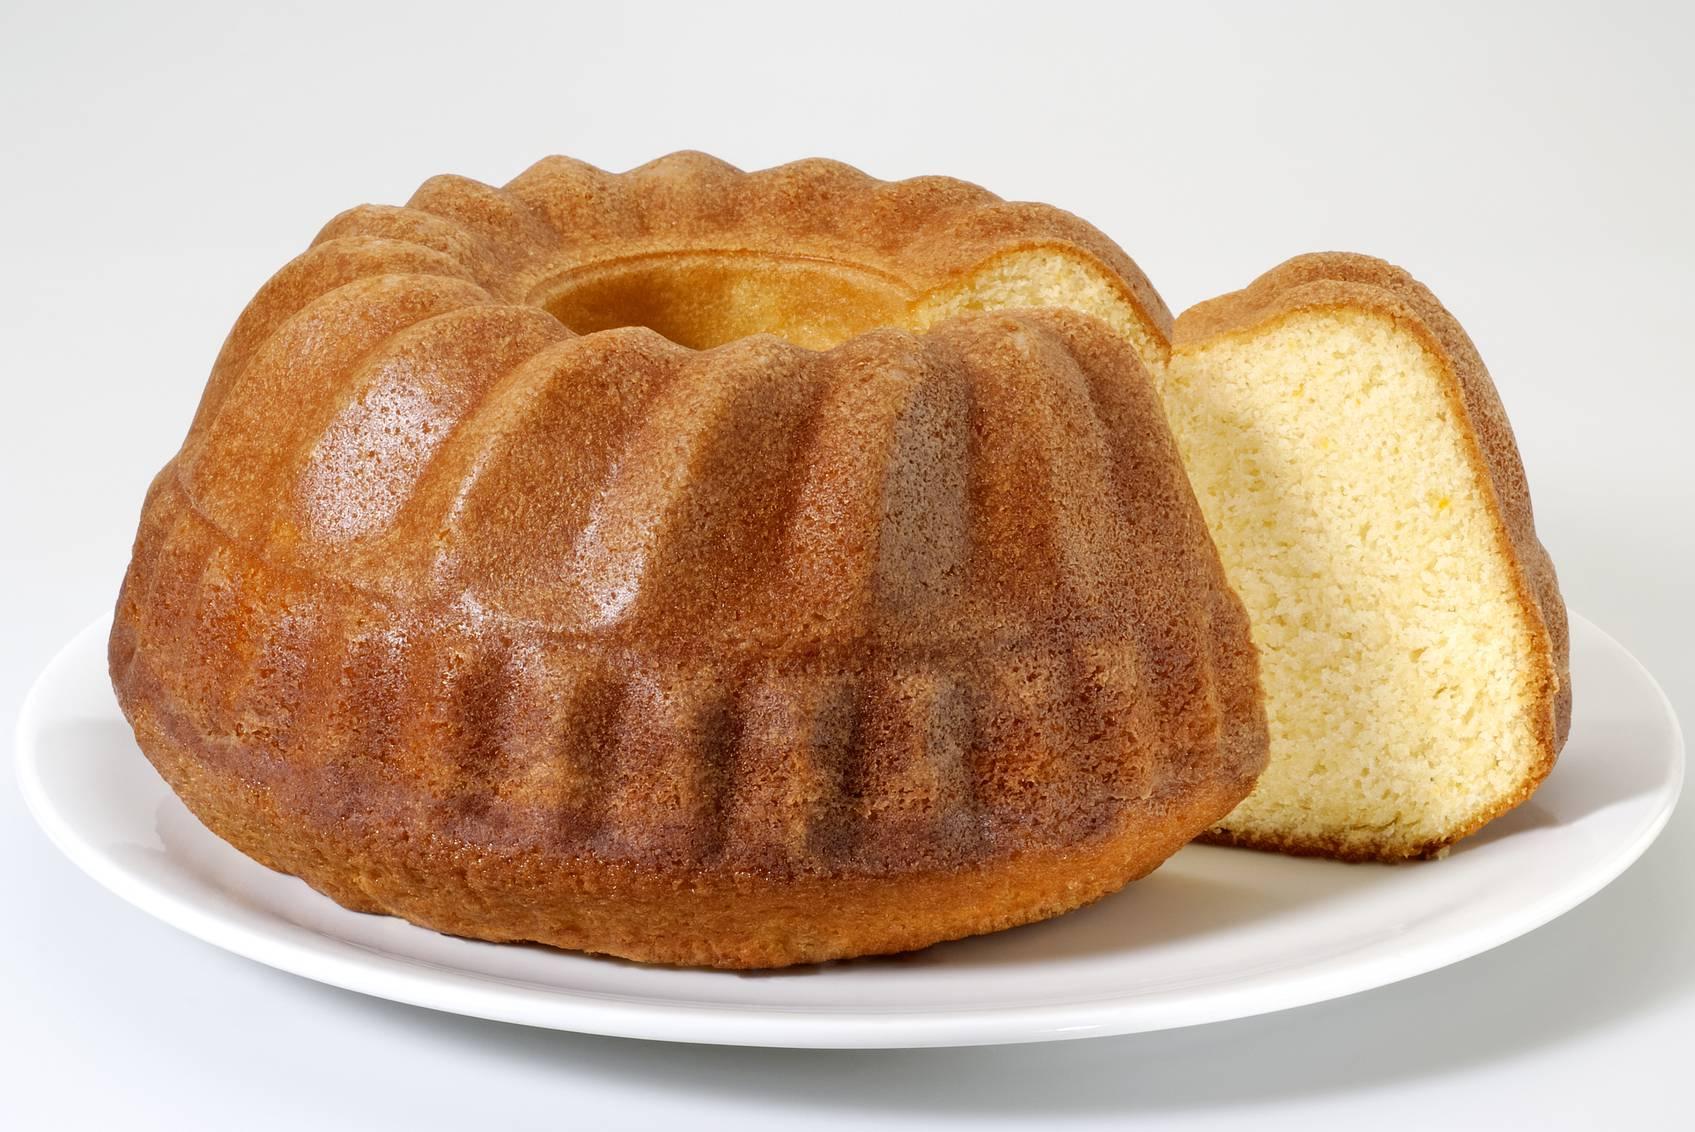 Torta leggera senza grassi